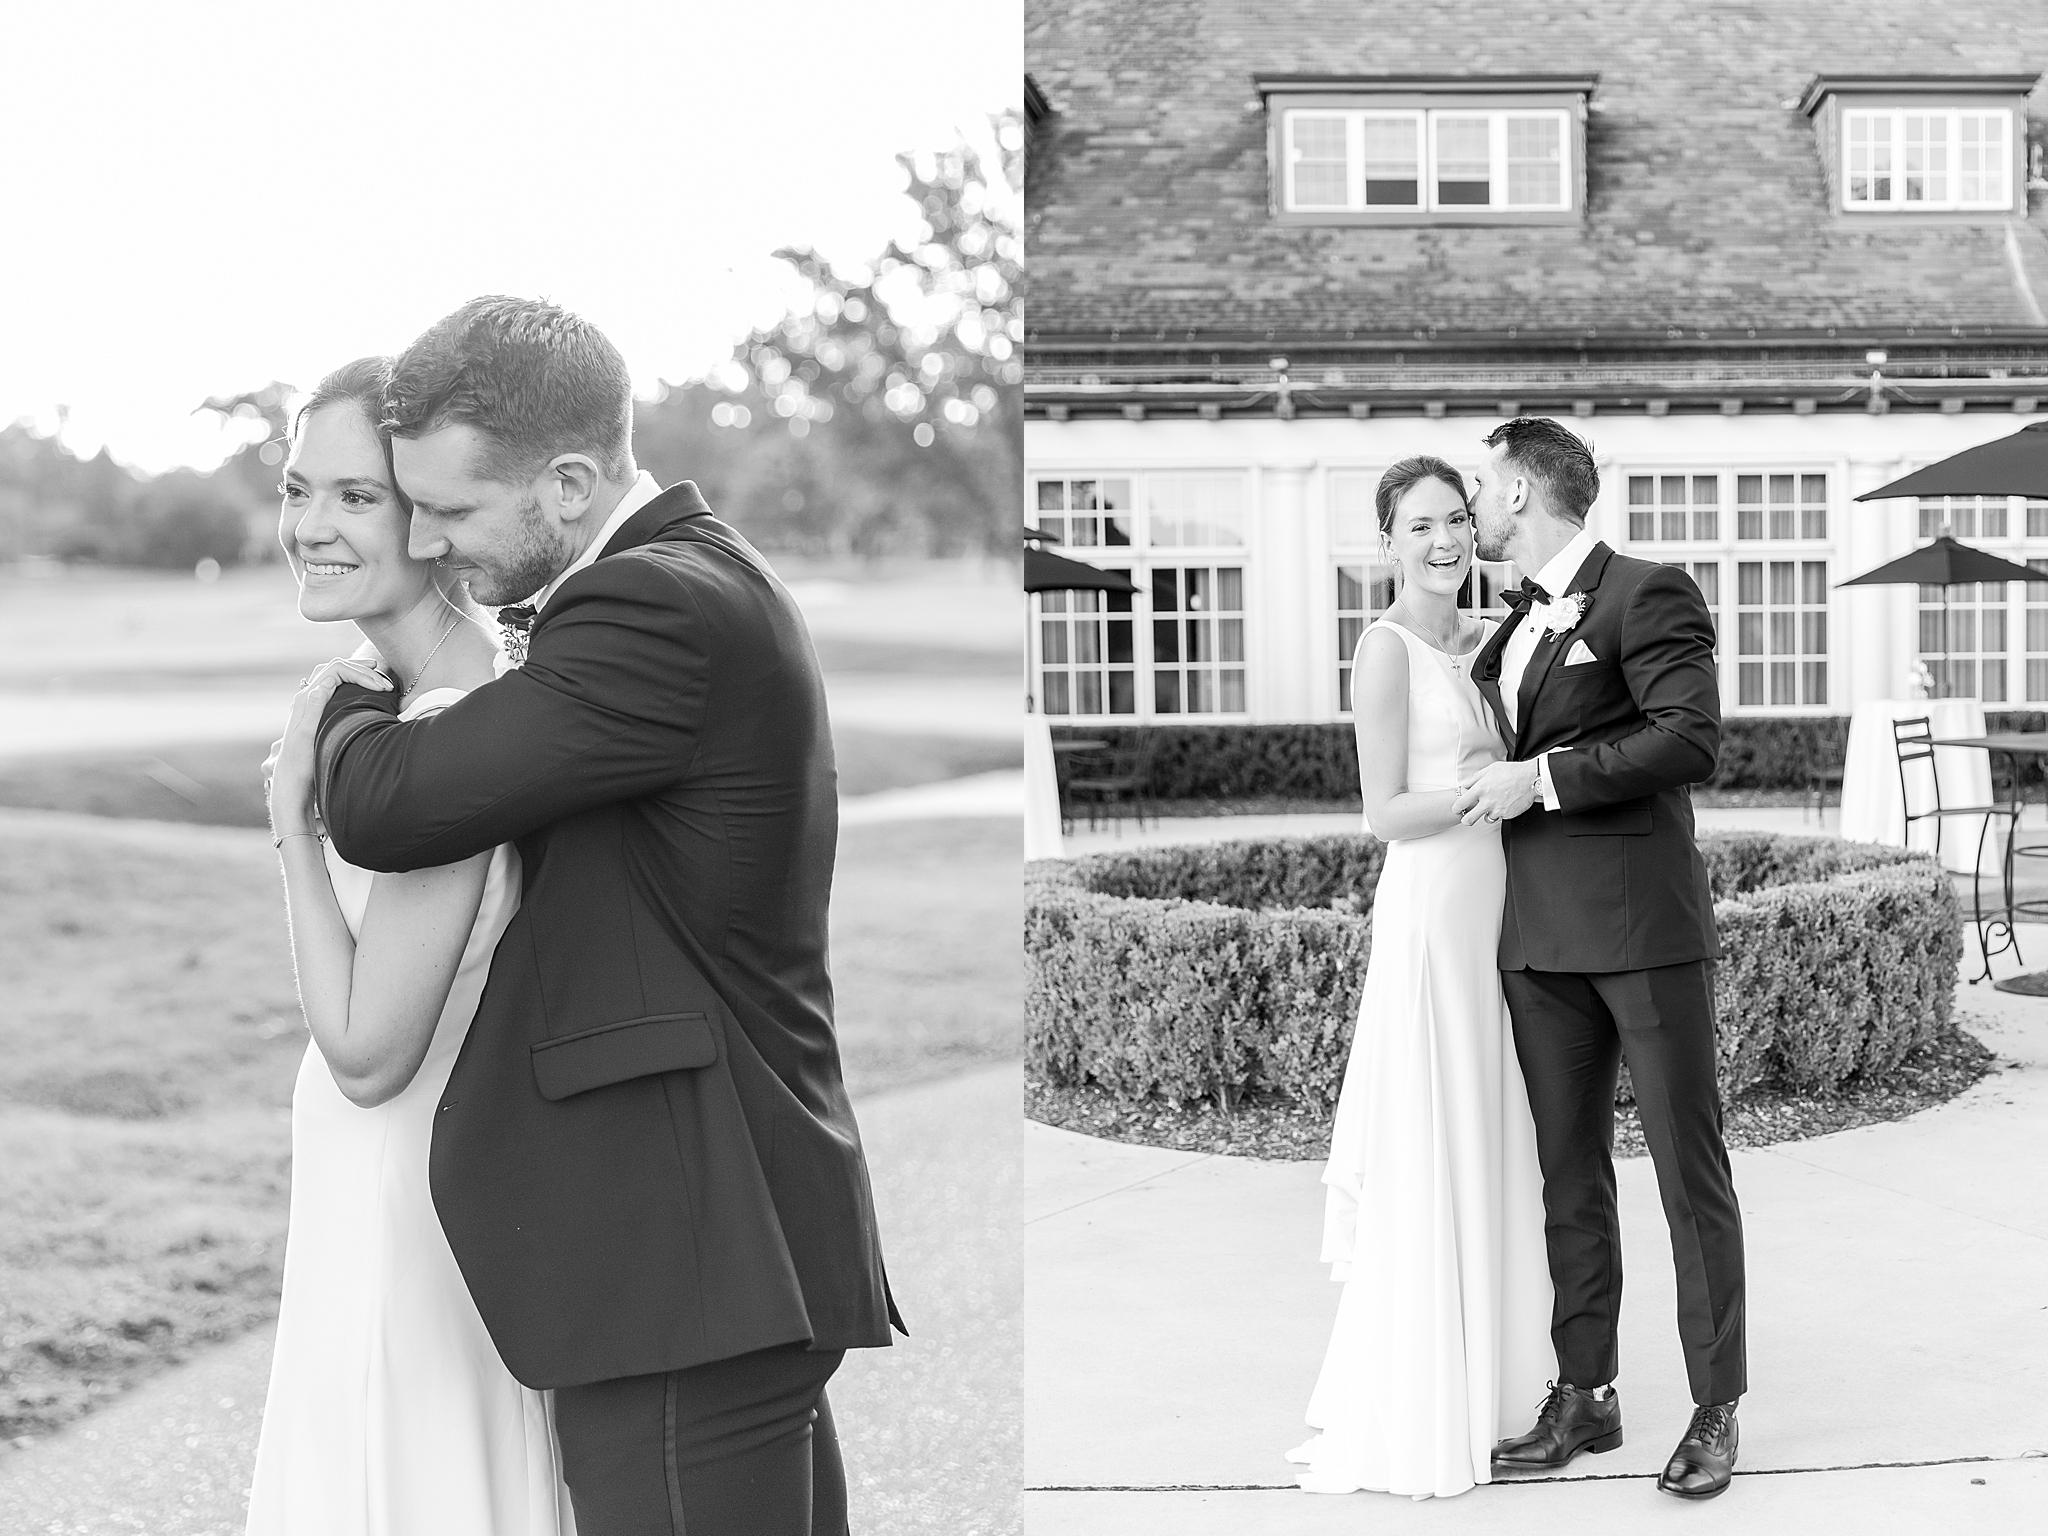 detroit-wedding-photographer-grosse-pointe-academy-chapel-detroit-golf-club-wedding-carly-matt-by-courtney-carolyn-photography_0114.jpg